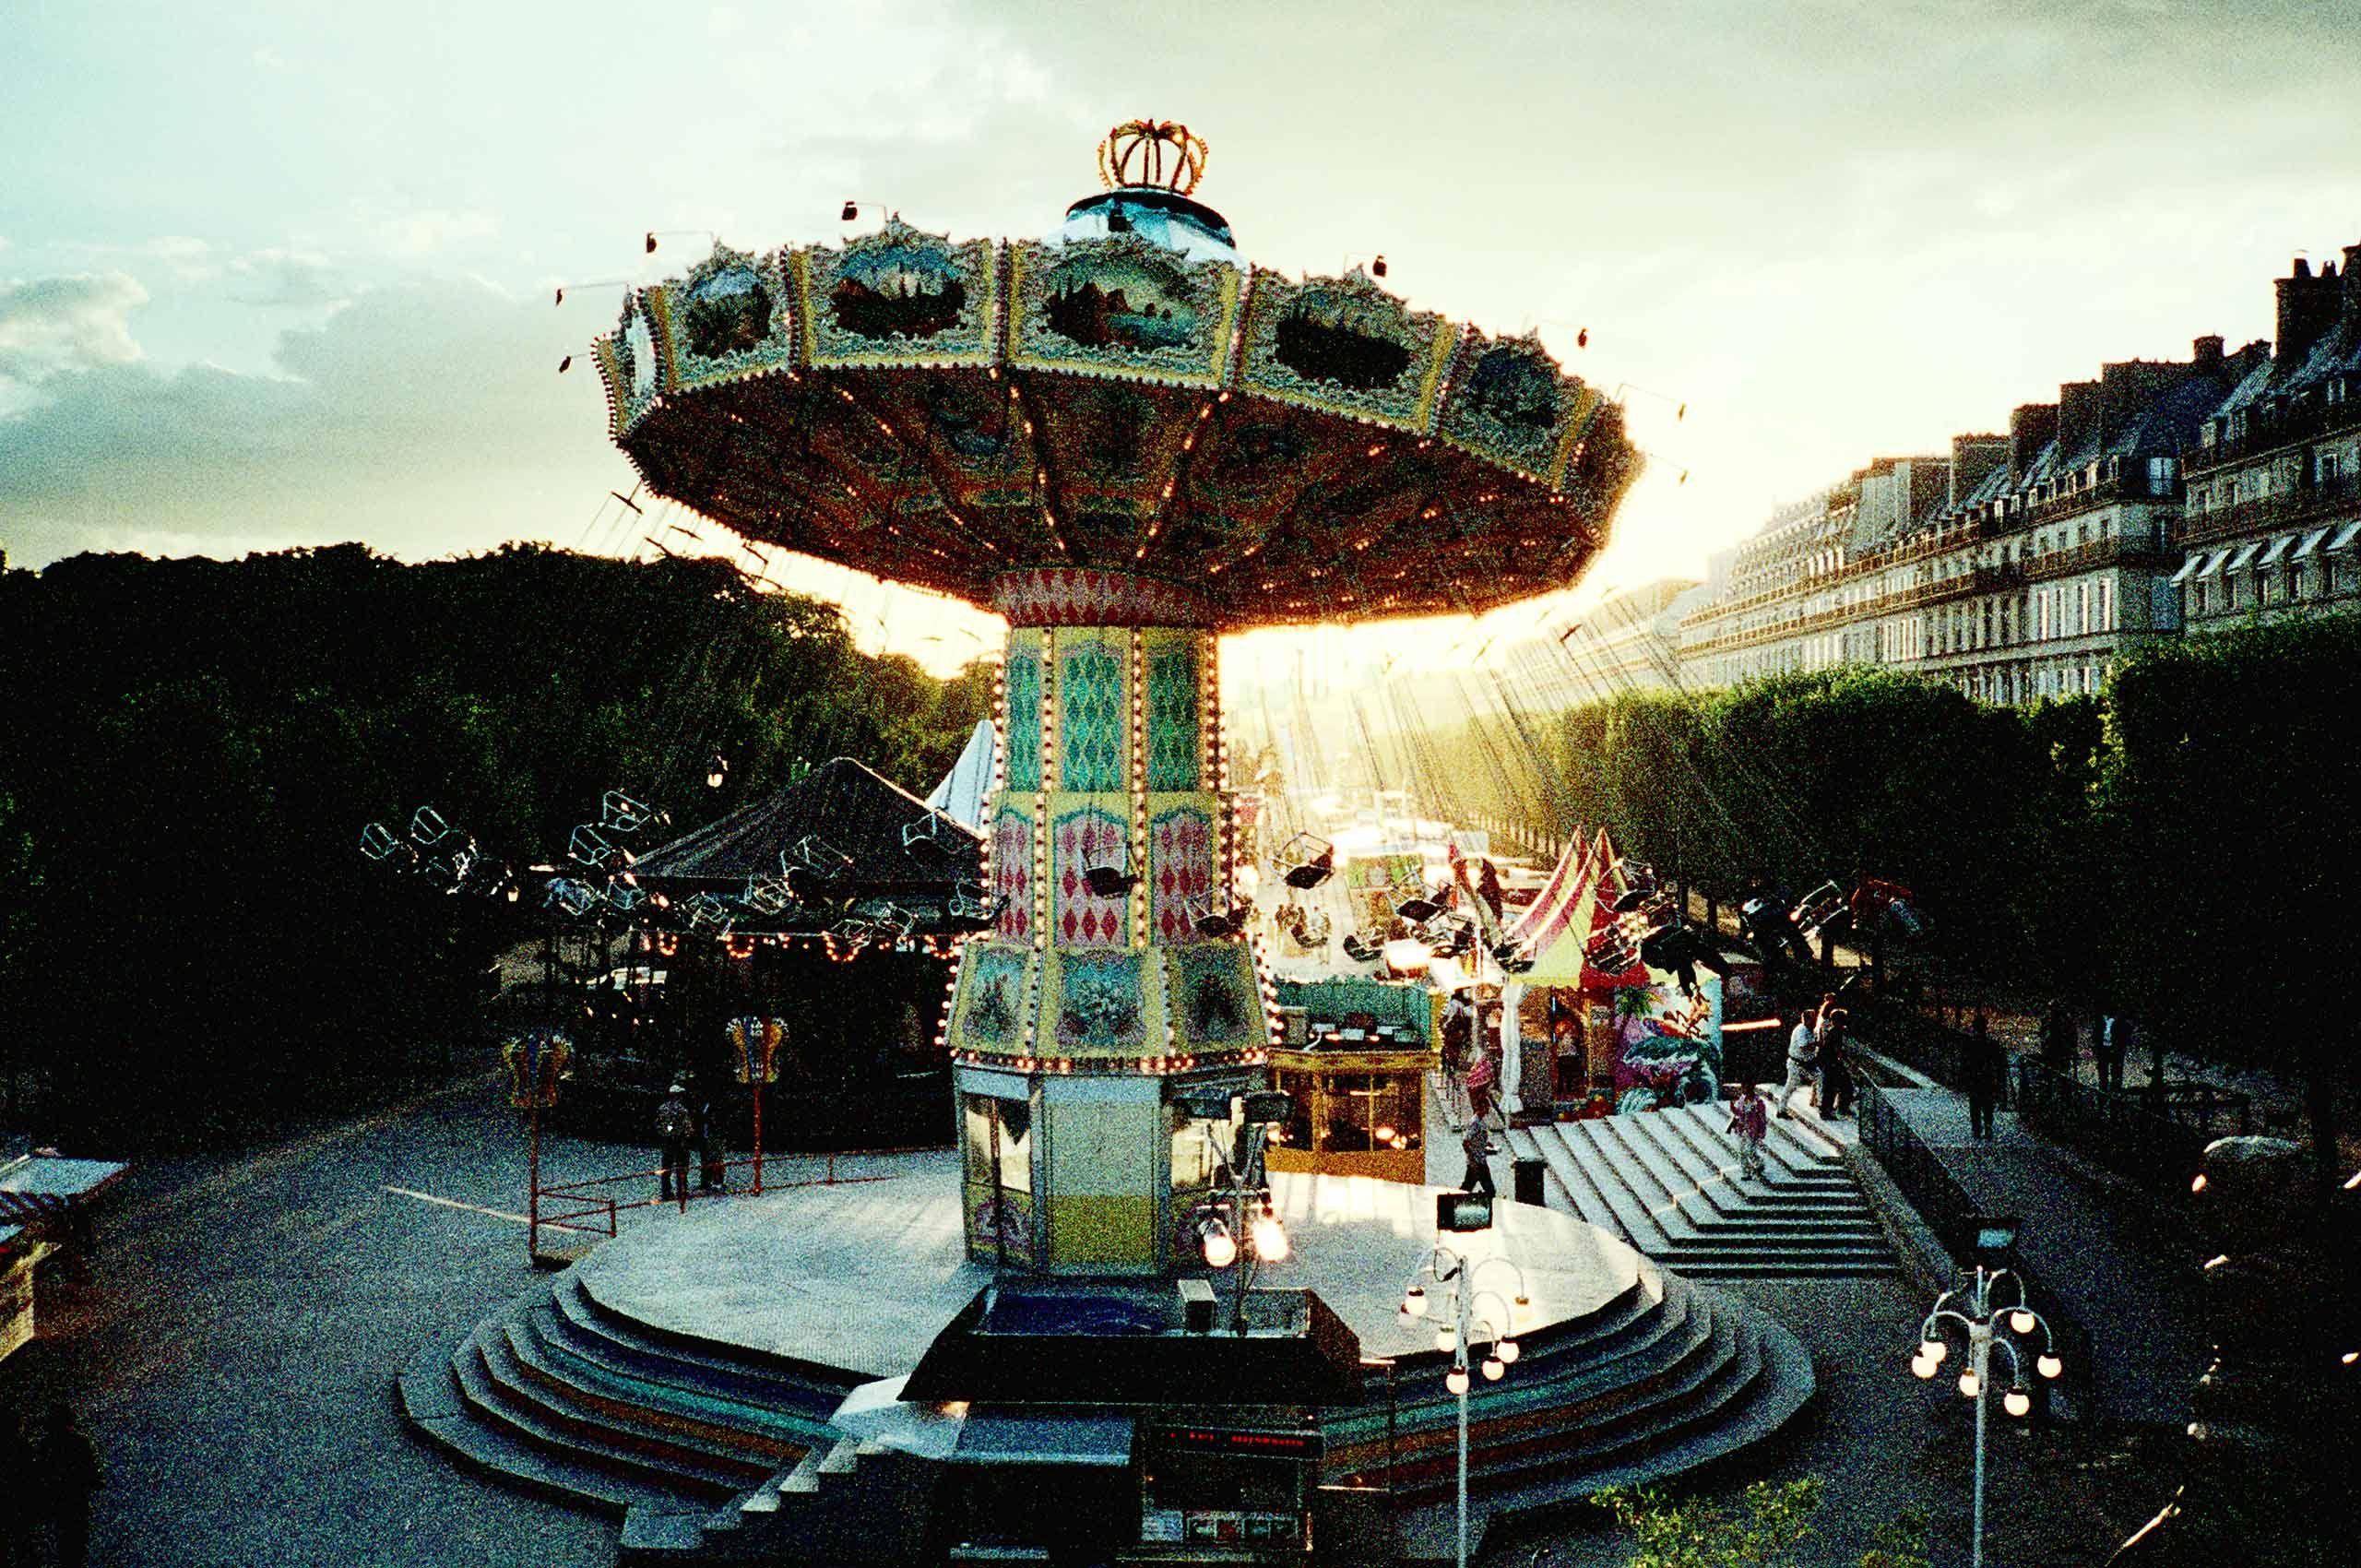 carousel-paris-by-henrikolundphotography.jpg